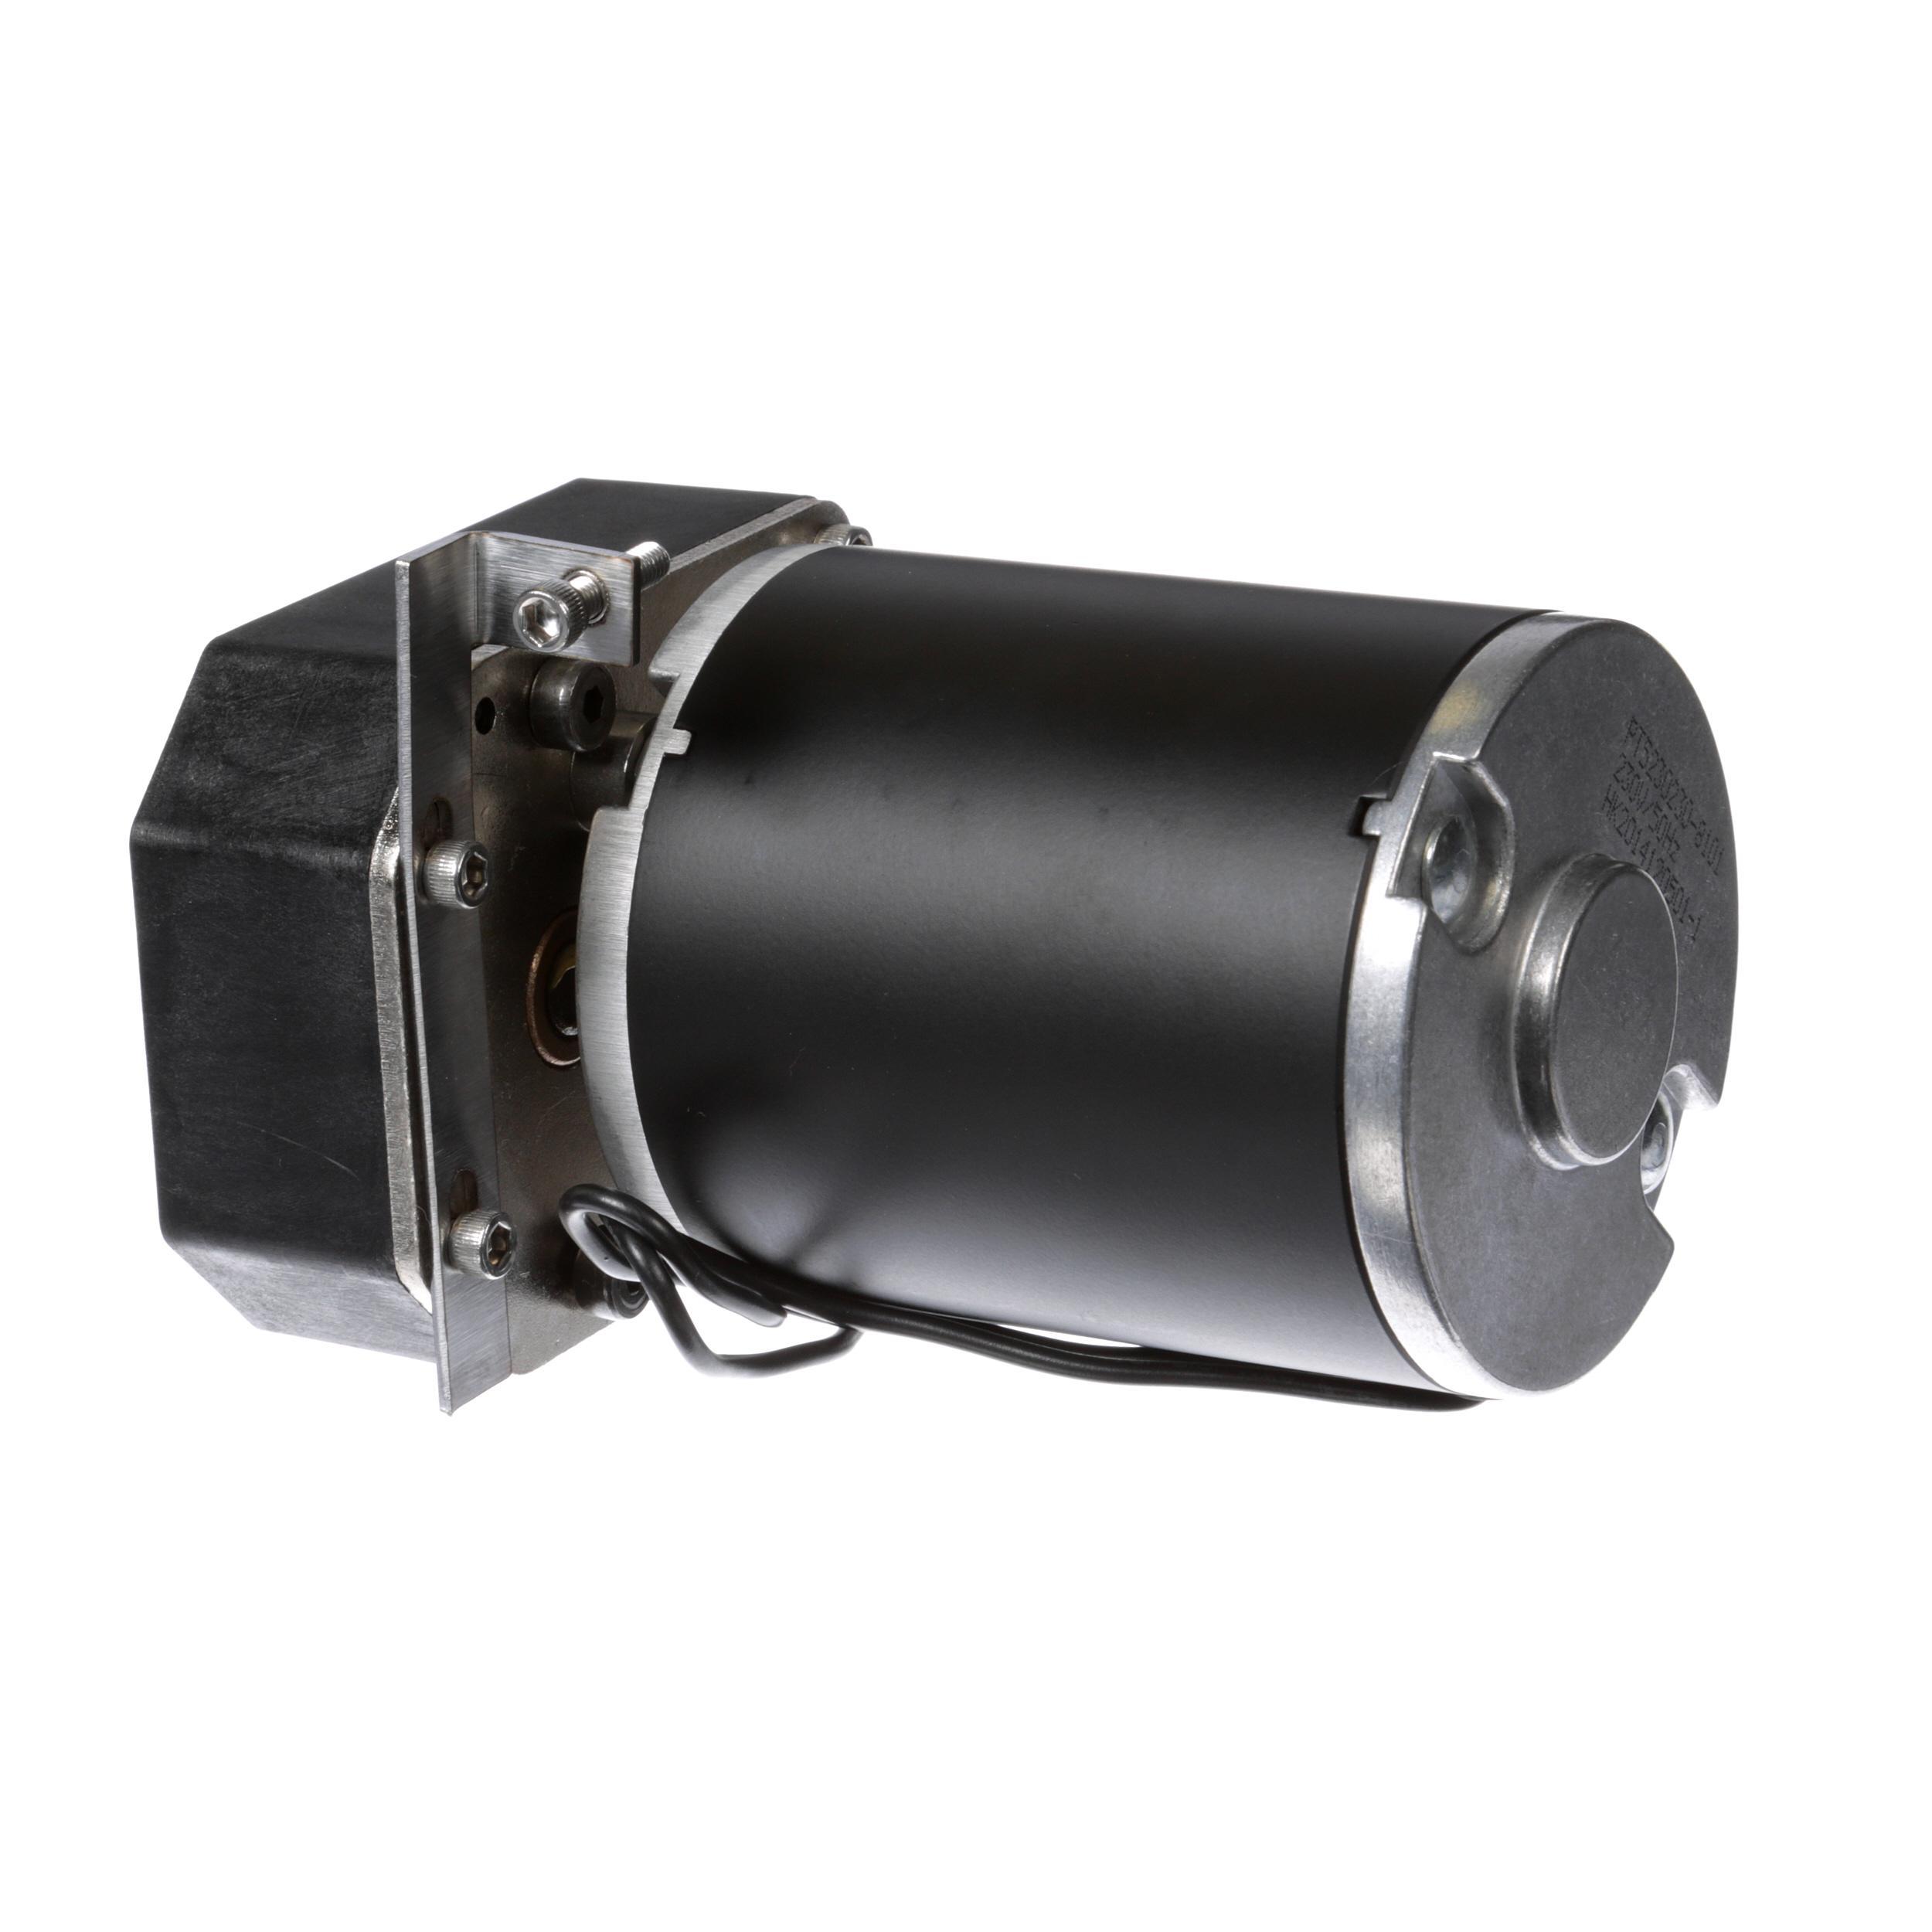 Edlund Dc Motor Gear Assy Part A588dc